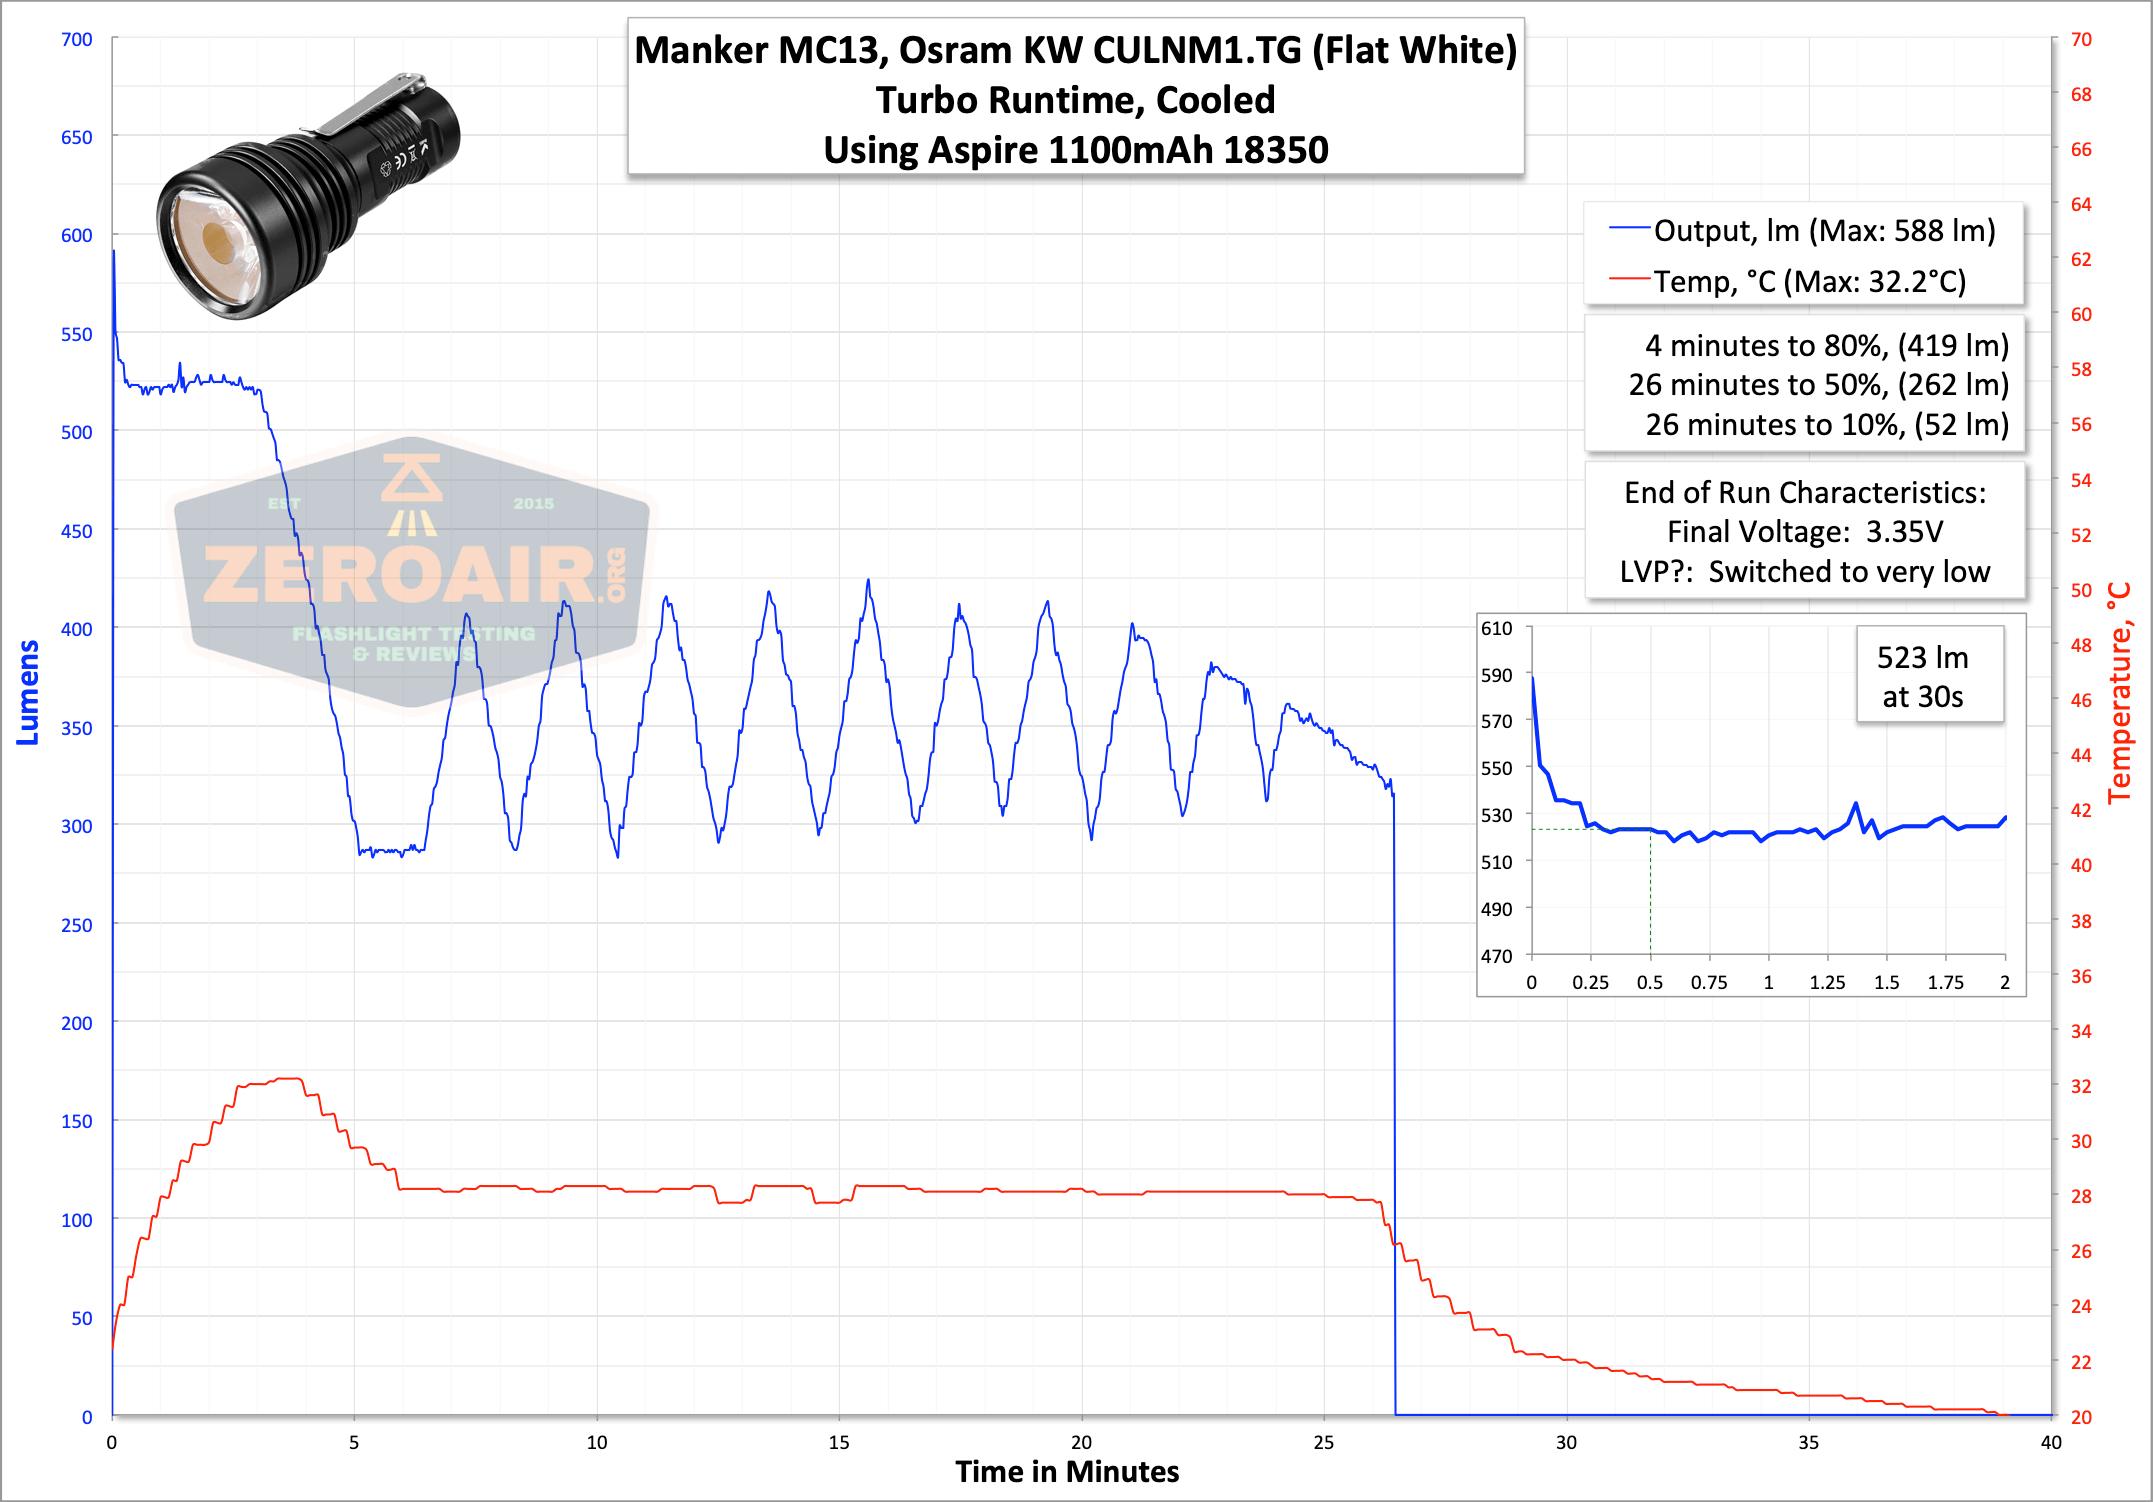 Manker MC13 thrower flashlight 18350 runtime graph turbo